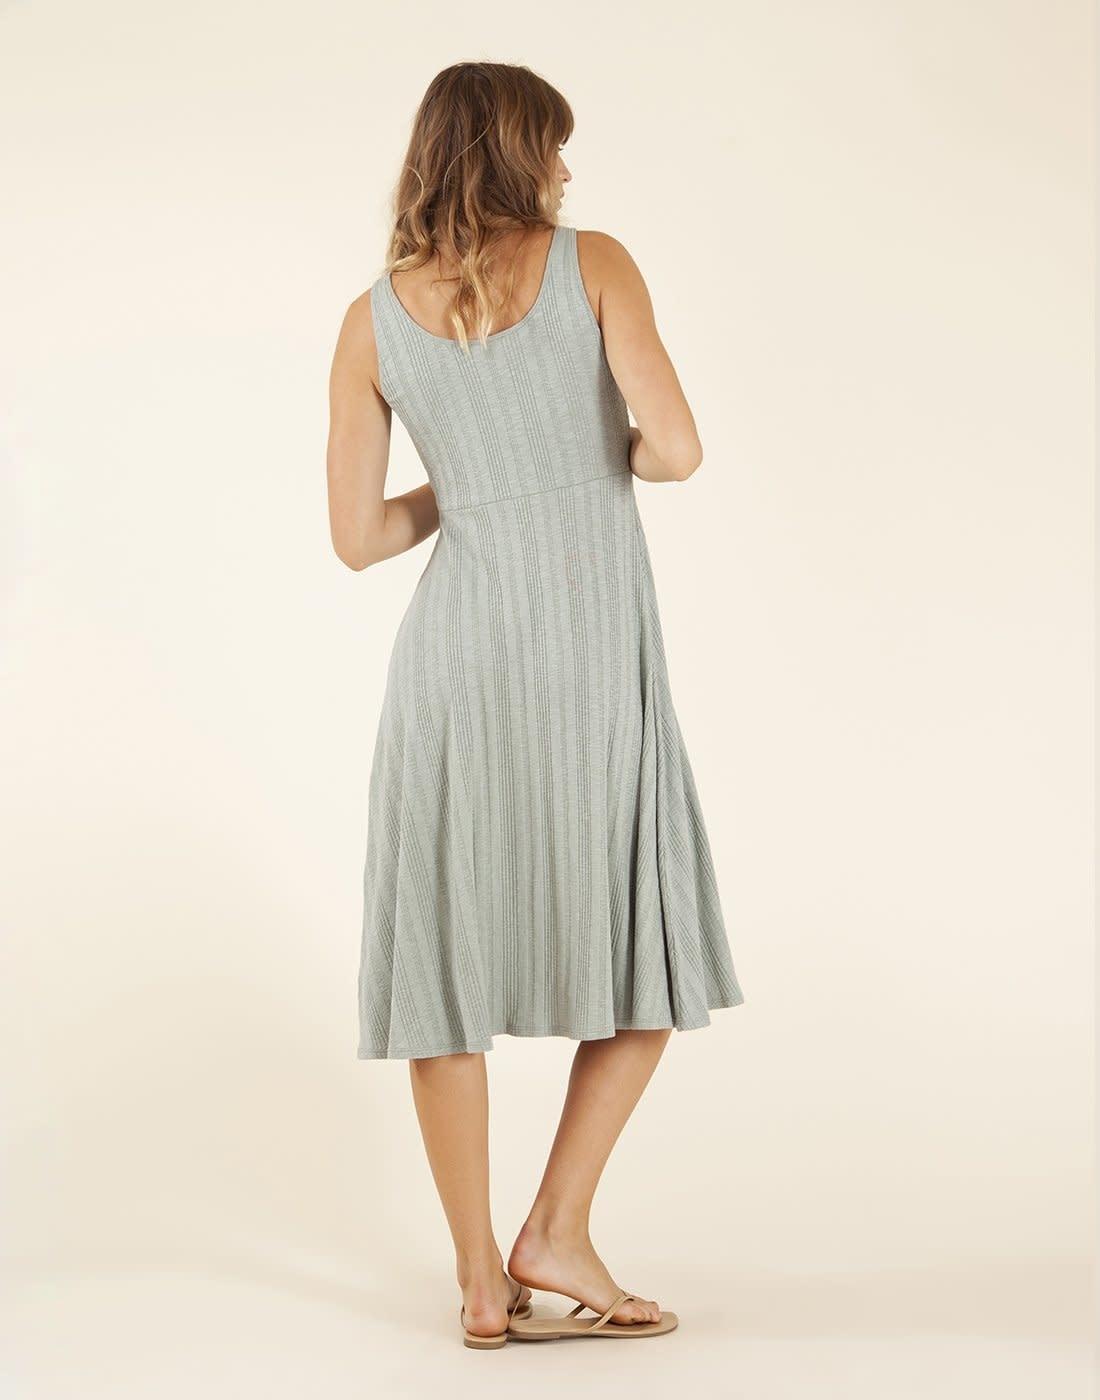 Carve Designs VENITIA DRESS